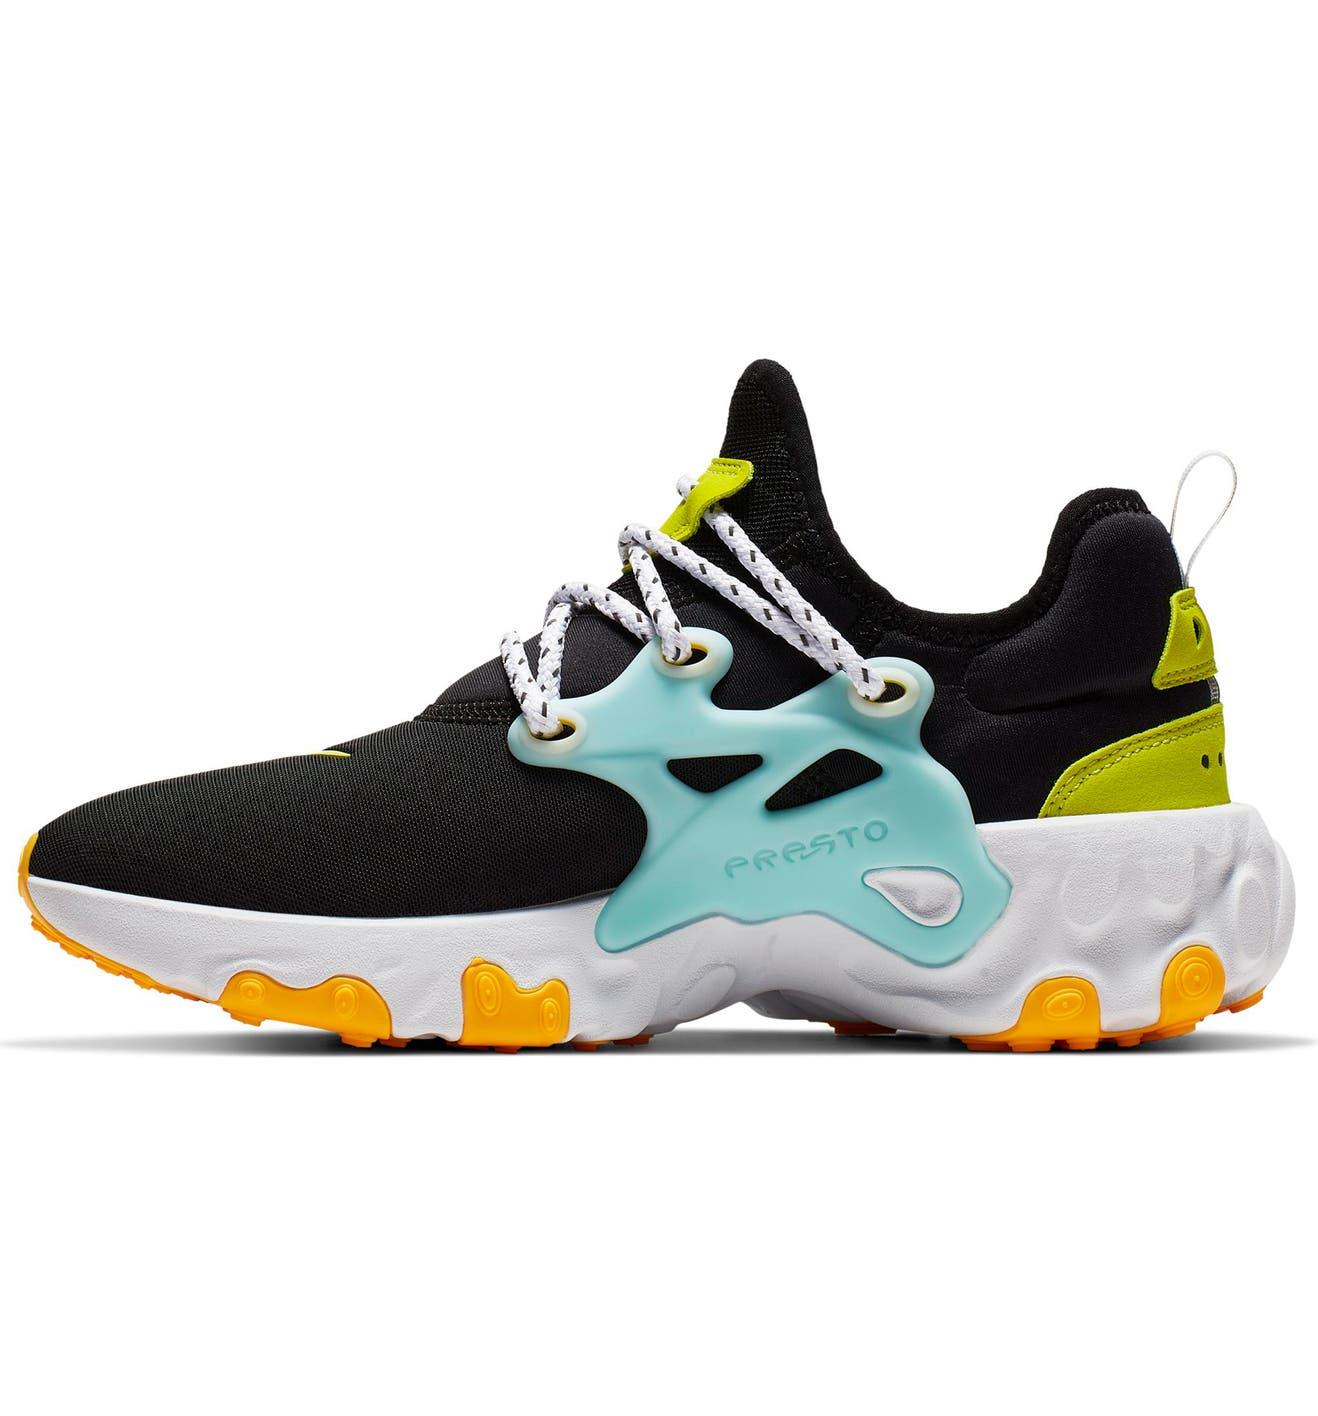 84440504f4 Presto React Sneaker